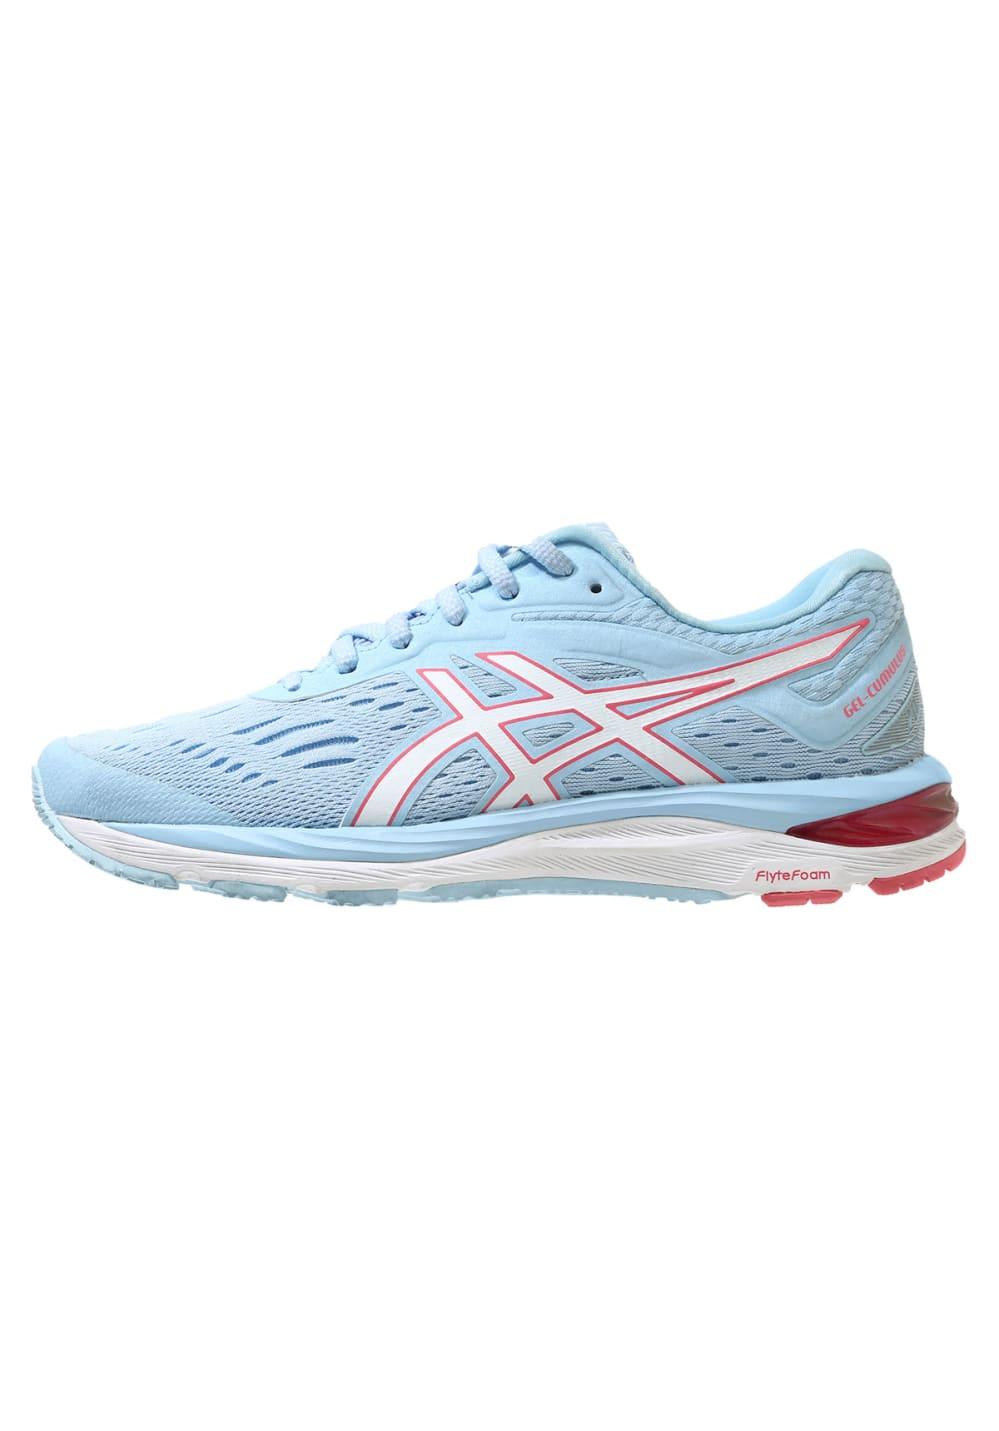 the best attitude fda1e 084d3 ASICS GEL-CUMULUS 20 - Running shoes for Women - Blue